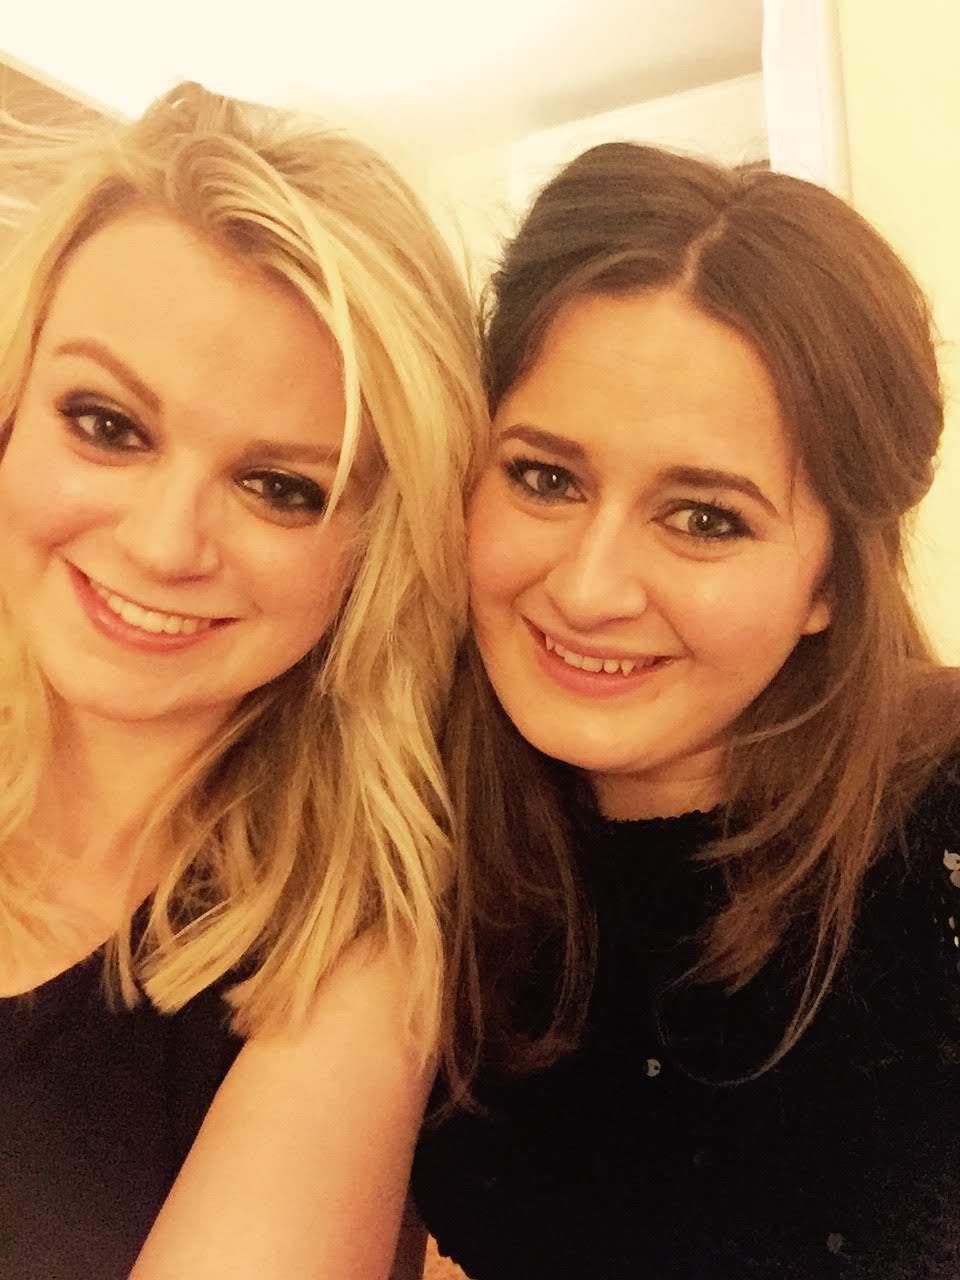 Girls on New Year's Eve in Cheltenham